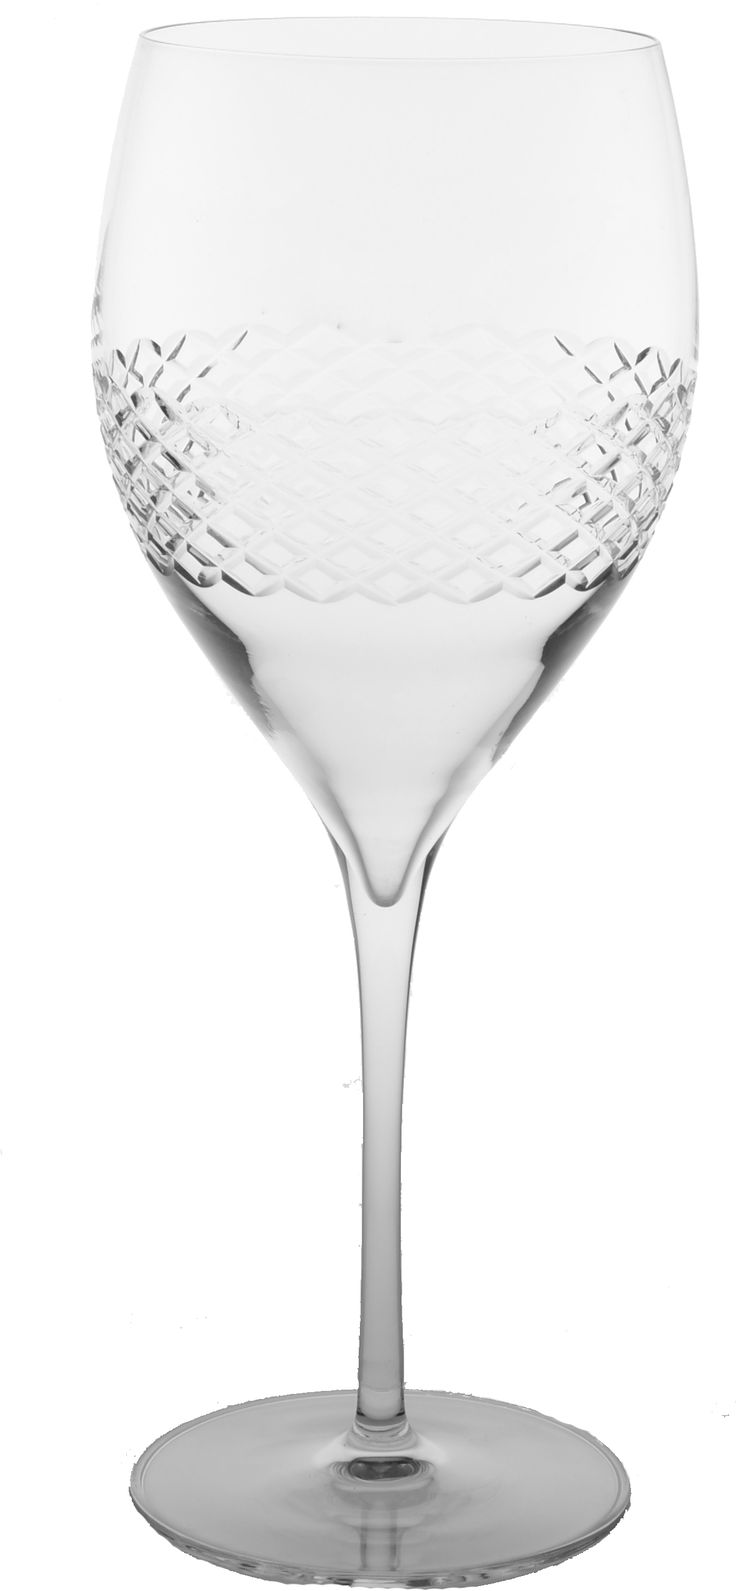 Diamond XL Red Wine Glasses Set of 4 23.75oz - $69.95 #glassware #wine #nautical #beach #tropical #bar #diamond #decor #kitchen